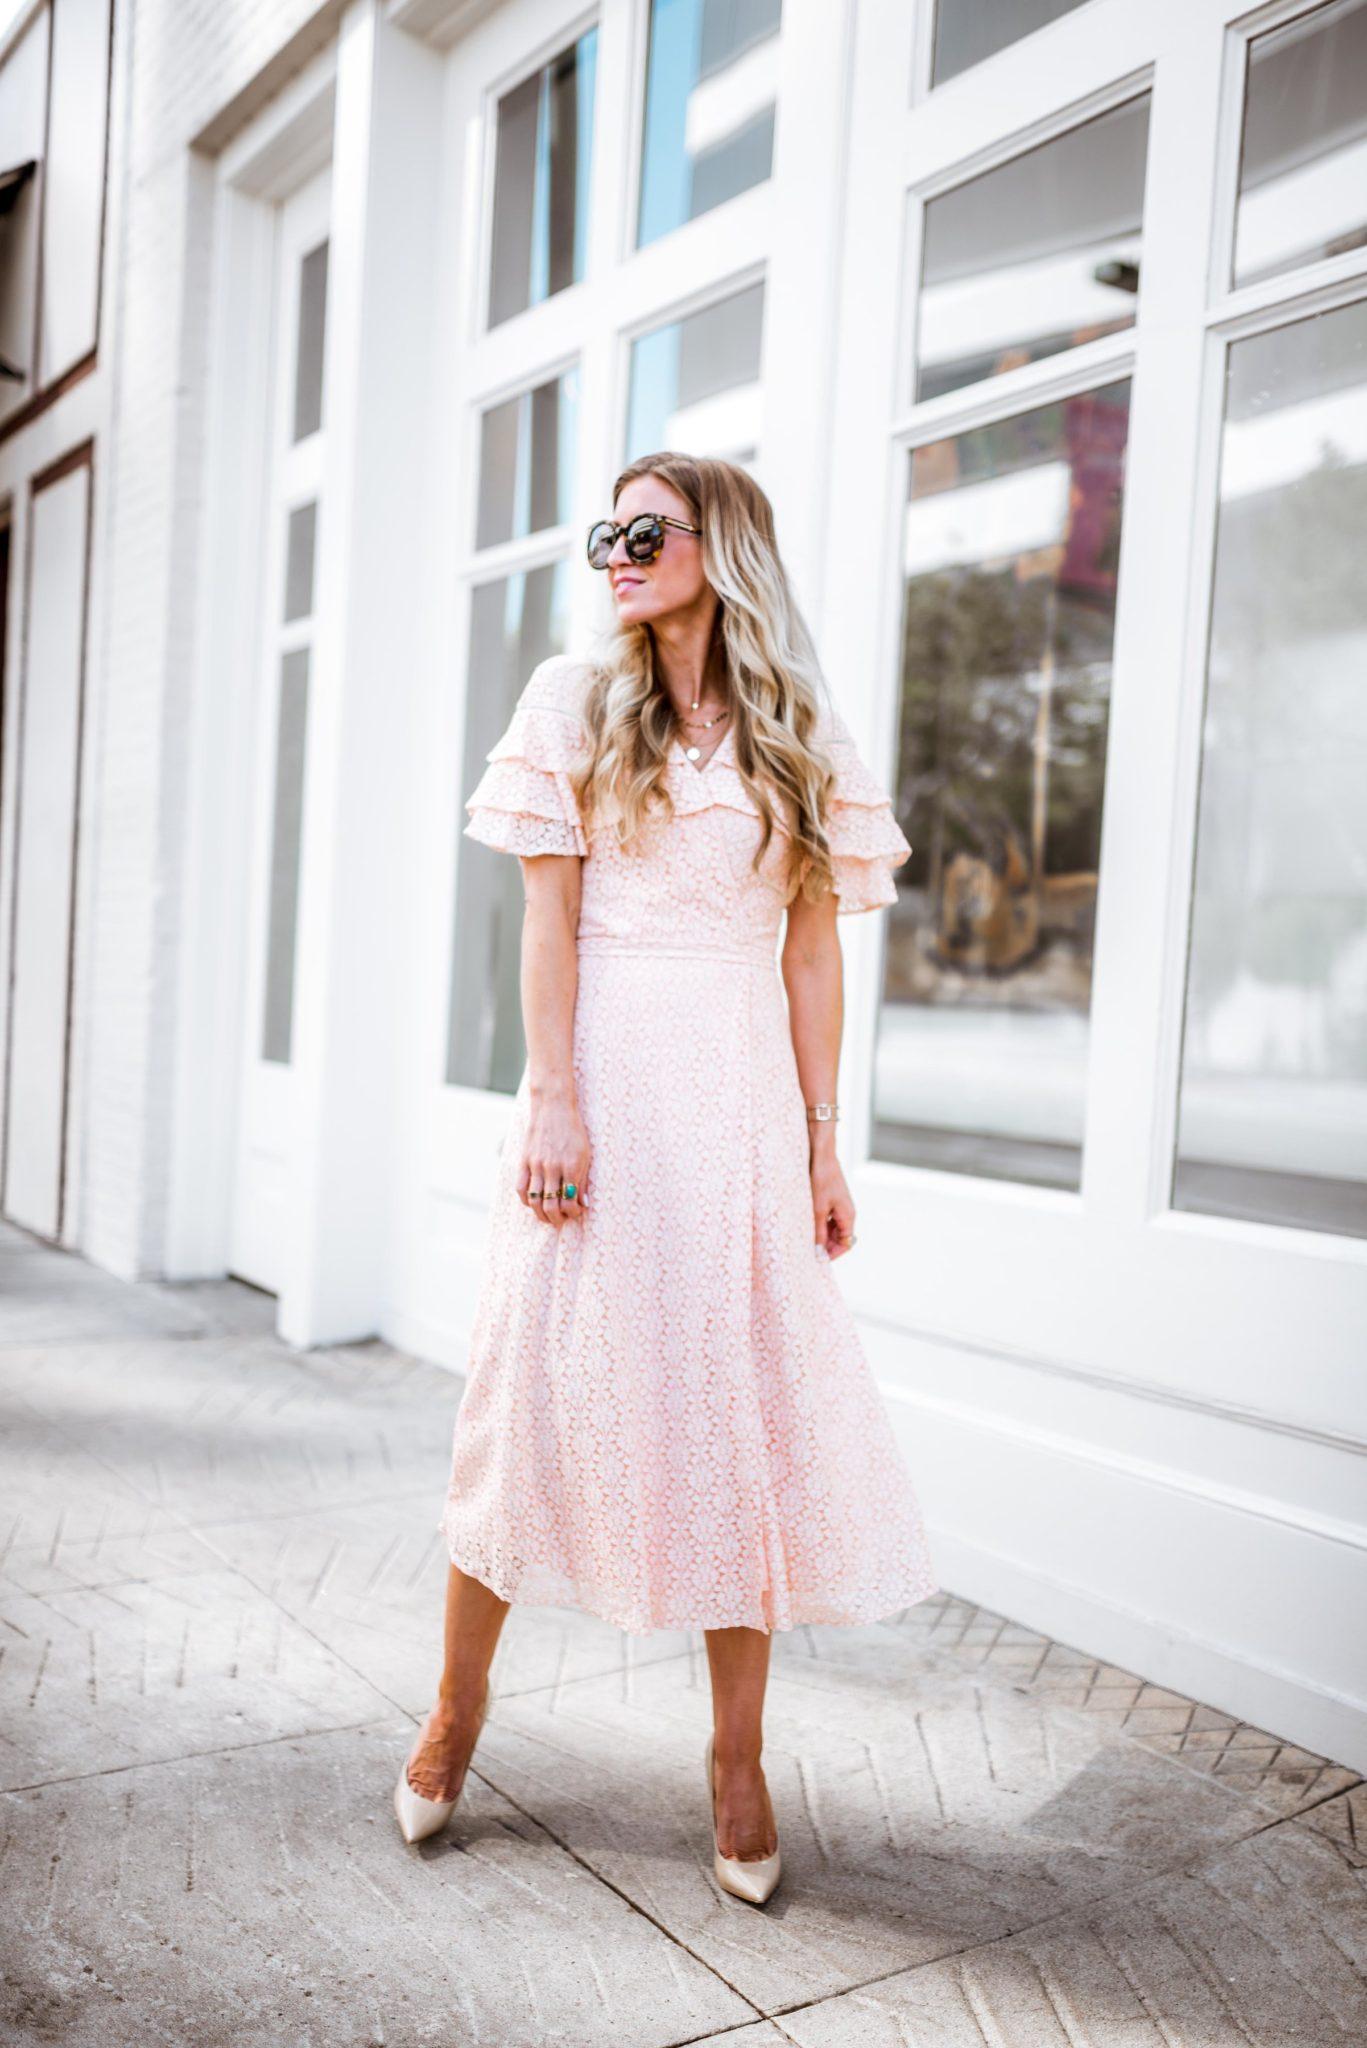 Blush lace ruffled Easter dress